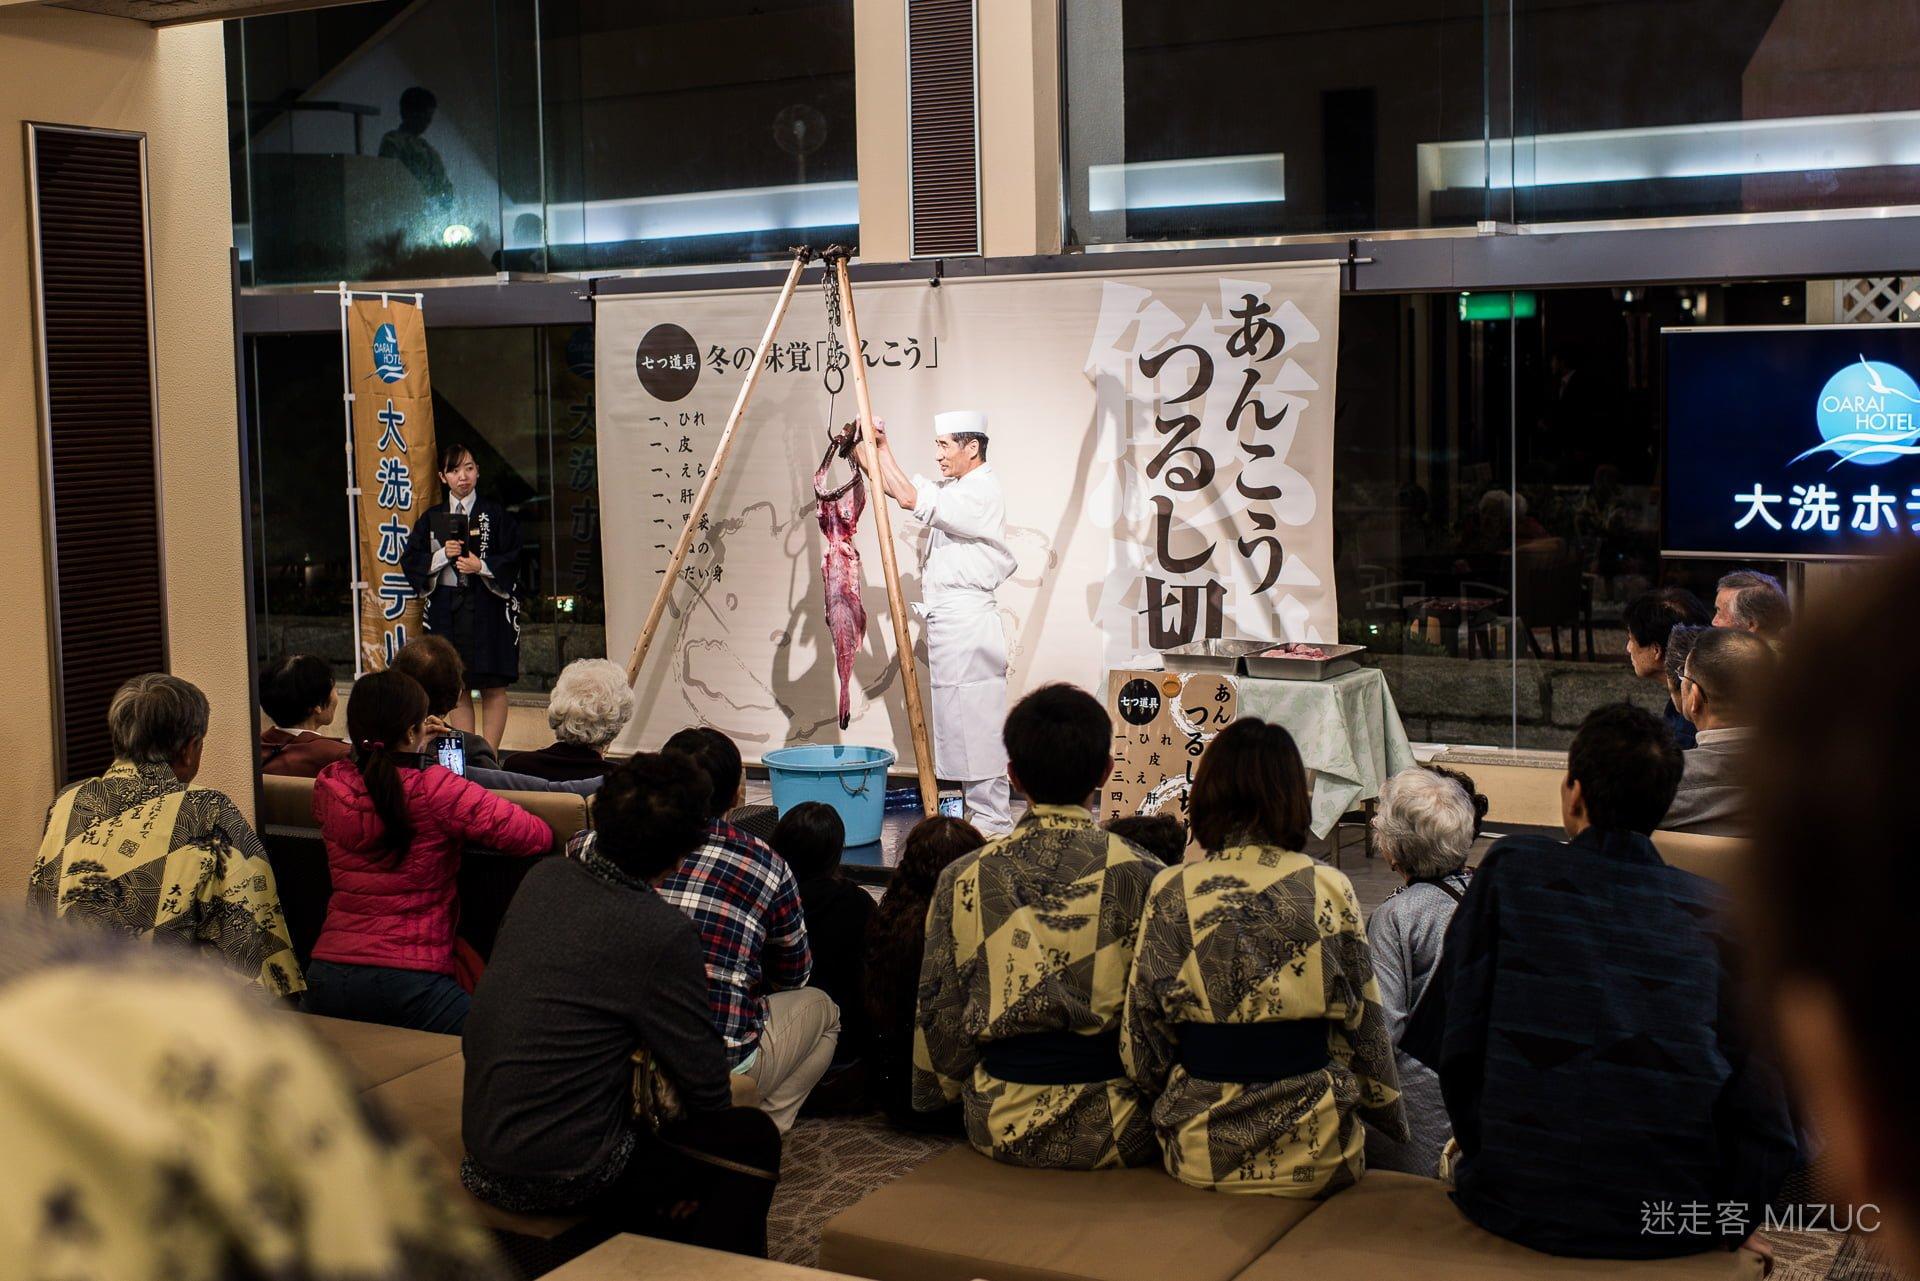 201711 Ibaraki Tochigi Gunma Japan Travel By RentalCar 12 日本自駕旅遊/北關東三縣「茨城、櫪木、群馬」秋天美食、溫泉與瀑布秘境百景(精選照片分享)